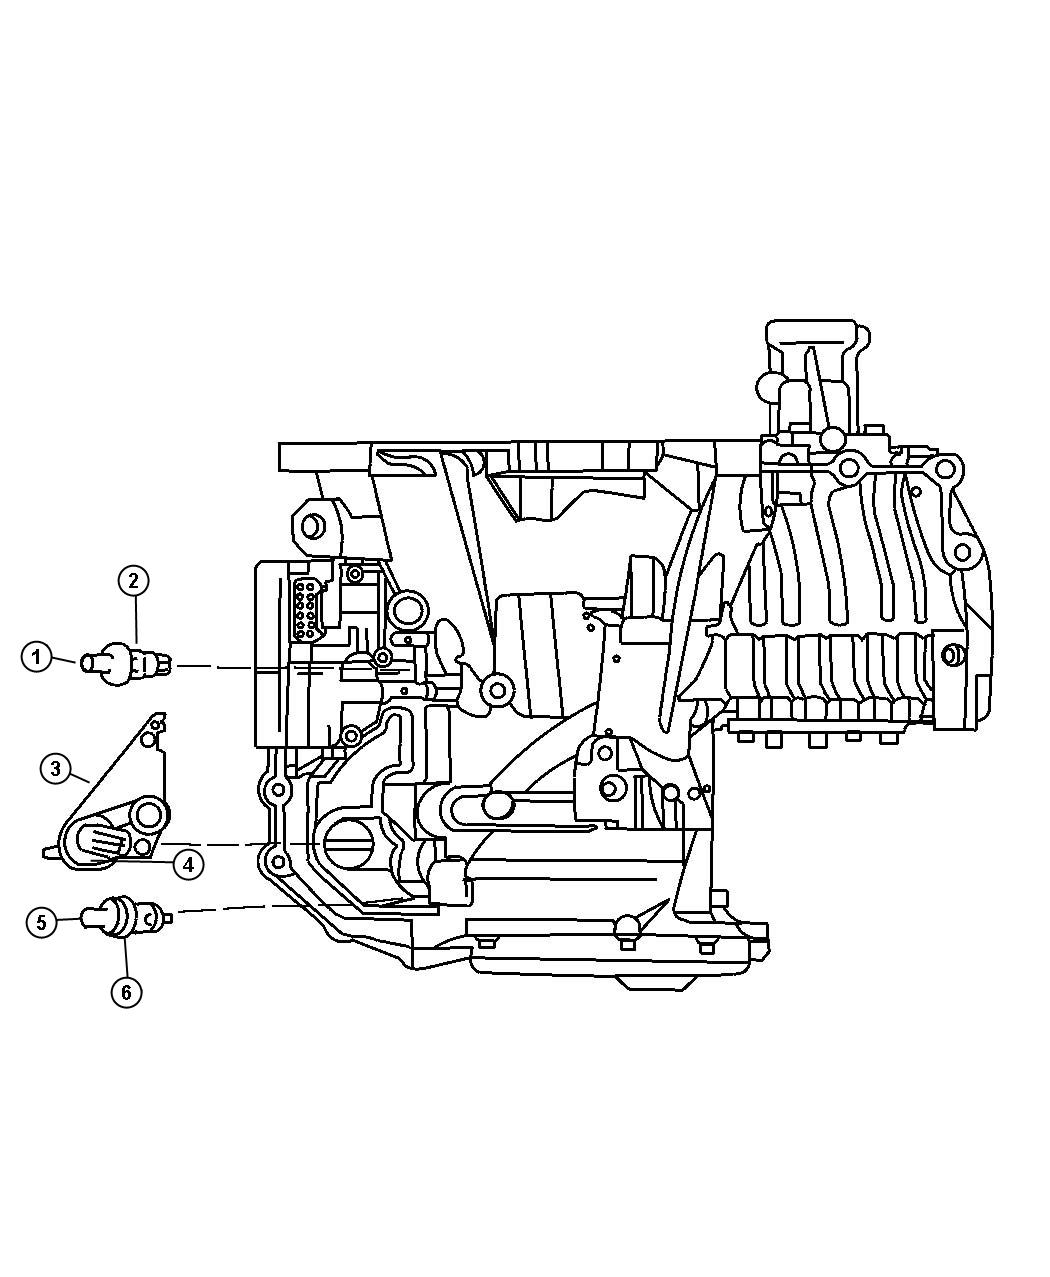 Chrysler Lhs Seal. Manual valve position sensor. Trans